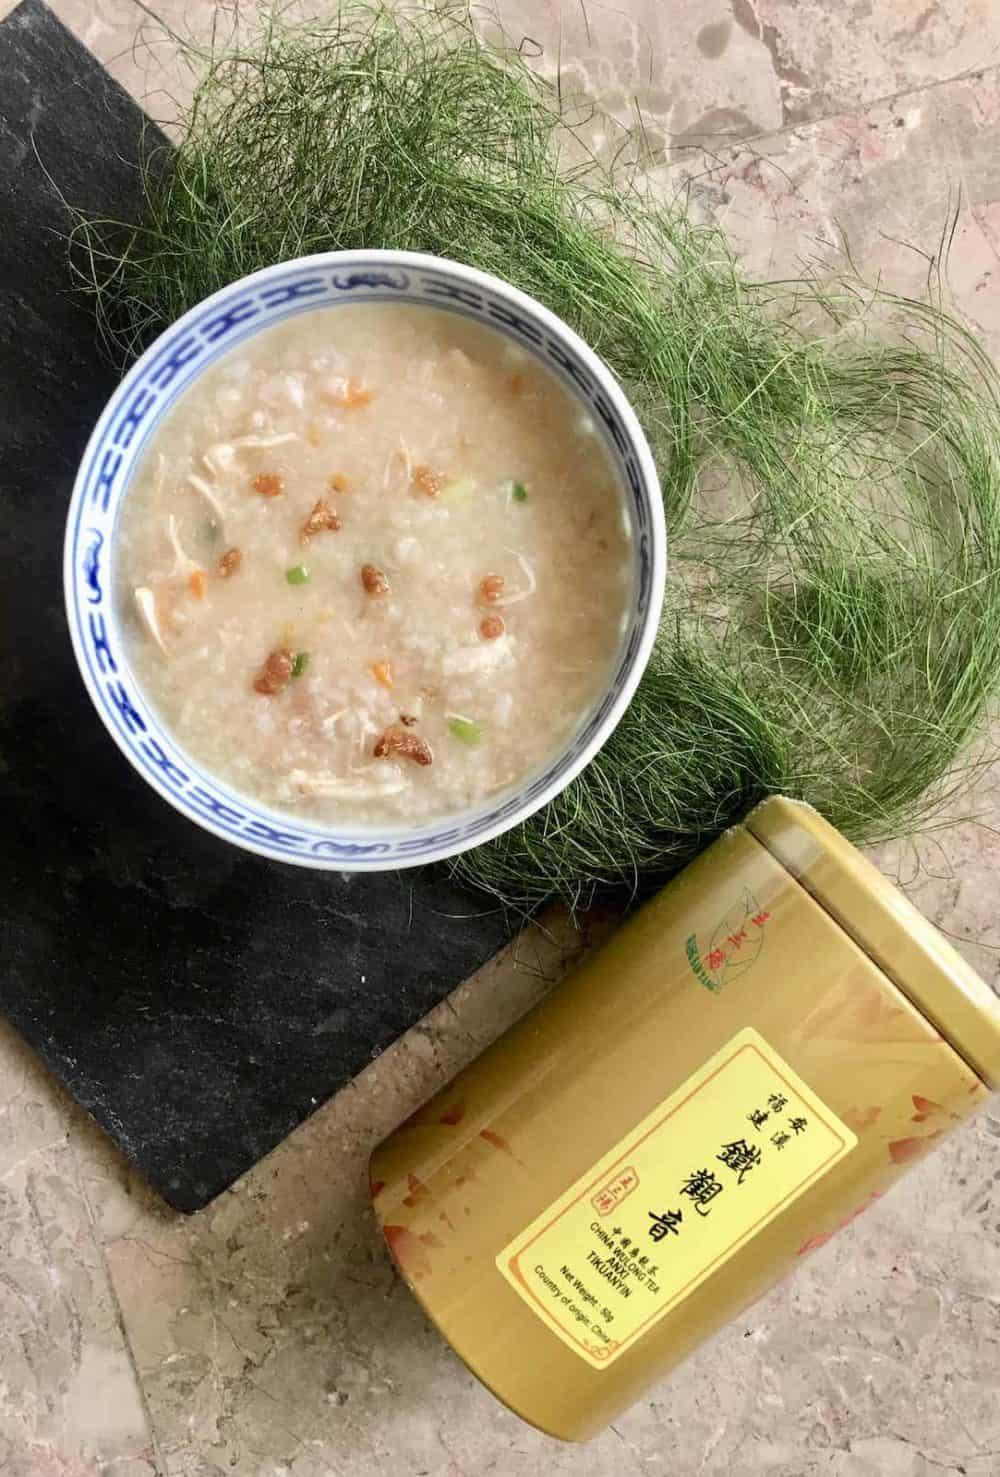 A bowl of chicken rice porridge and tea